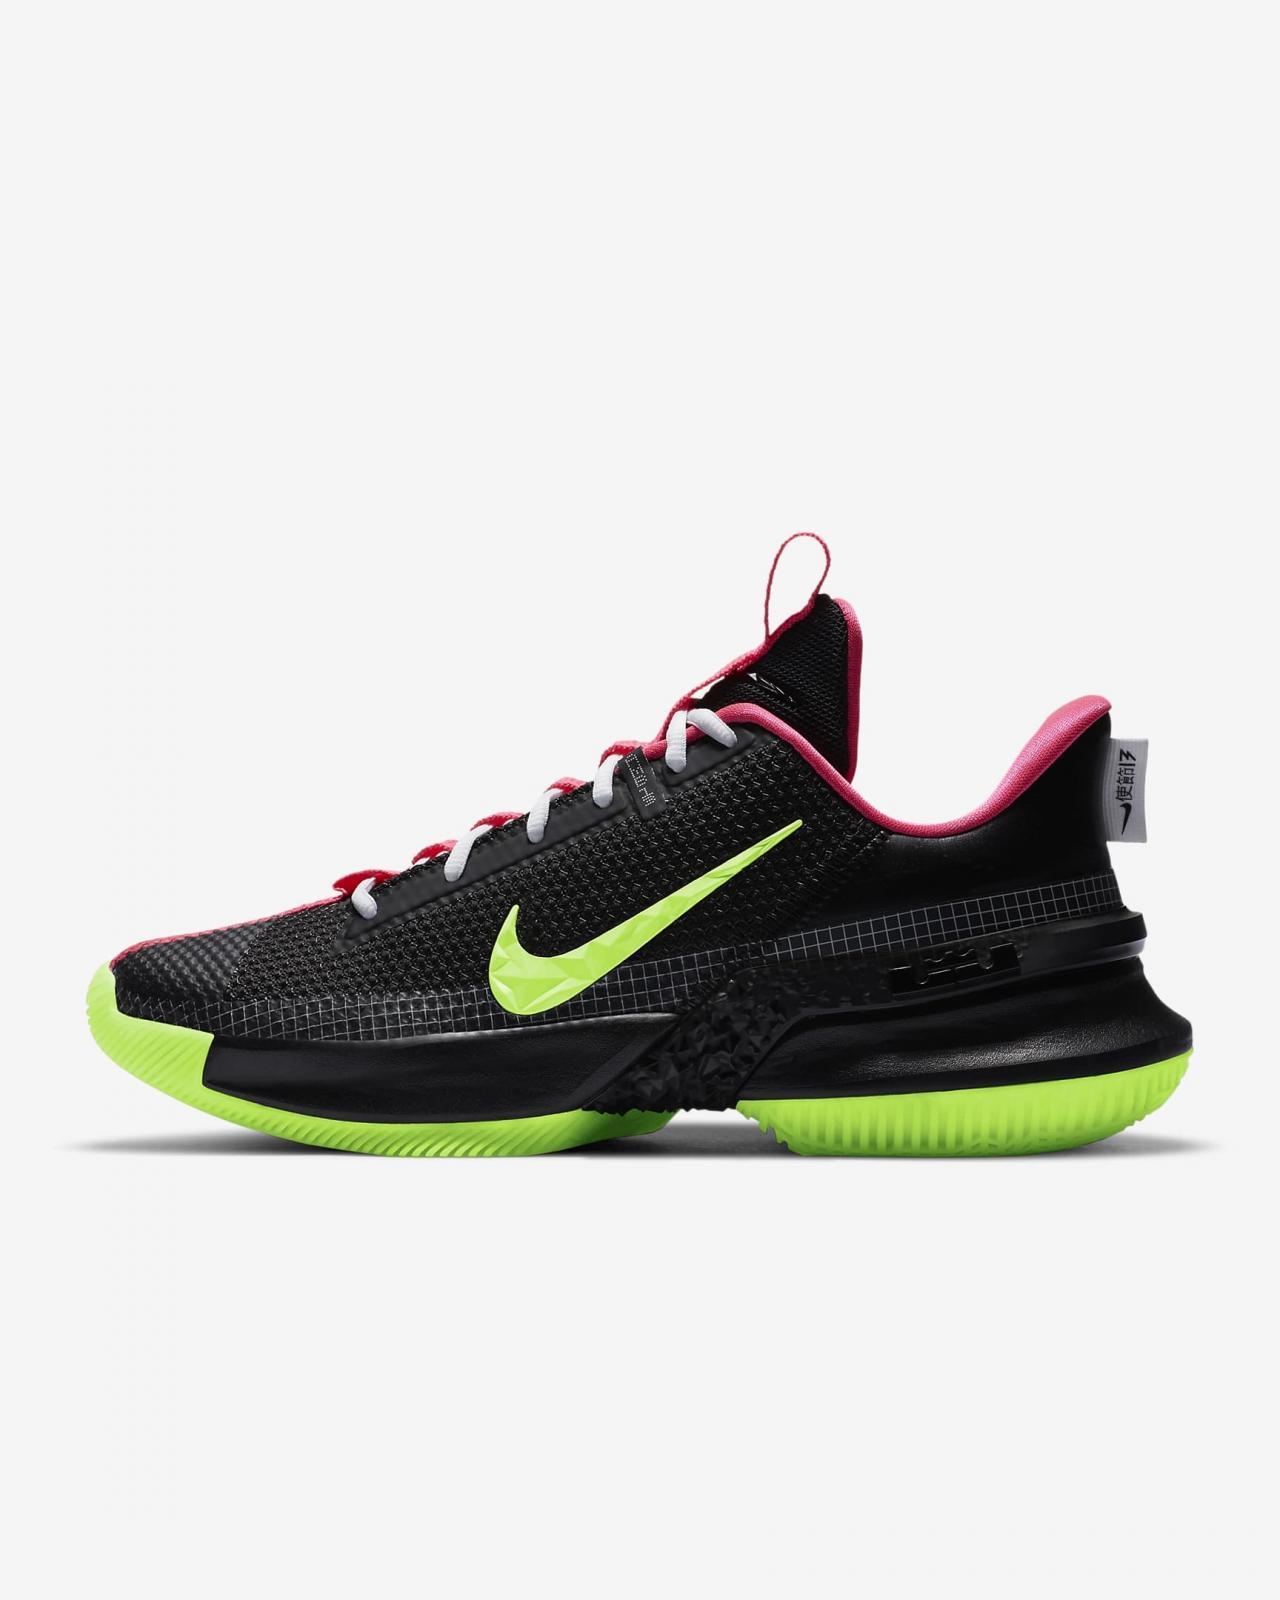 Nike Basketball推出黑/透明粉/白/微黄绿色Ambassador XIII